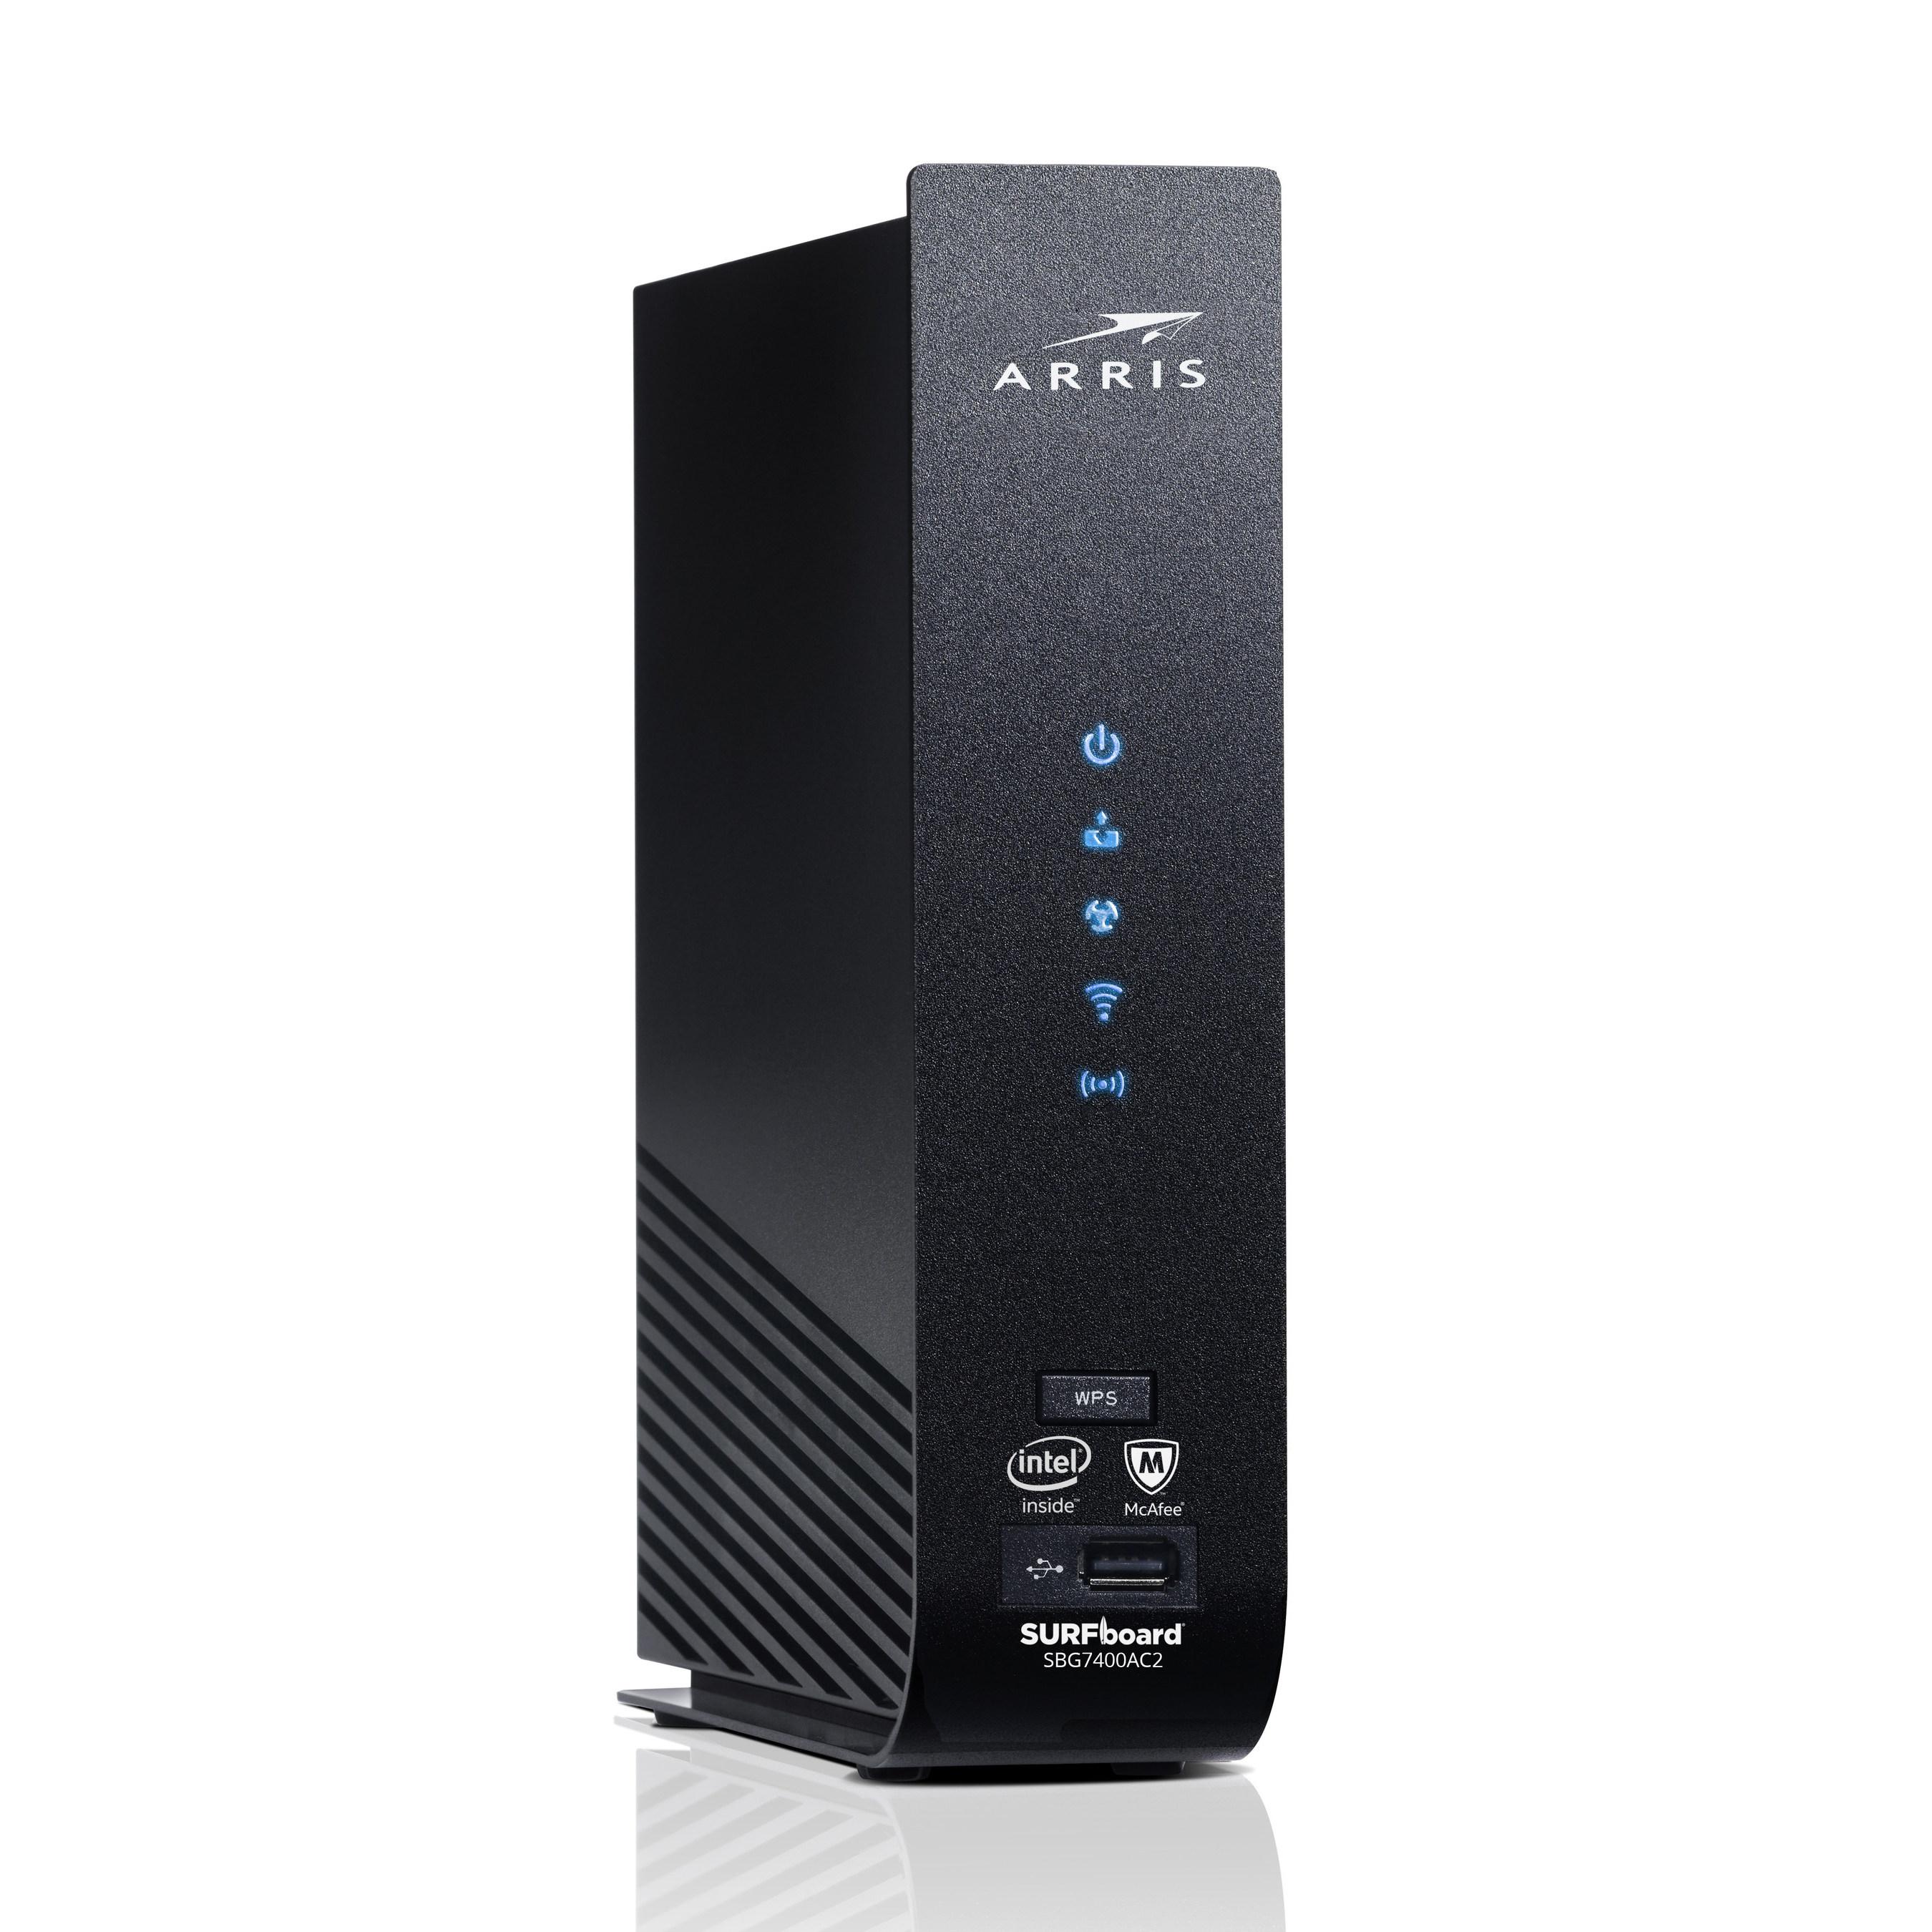 Arris Sbg7400 Ac2 Default Password Amp Login Manuals